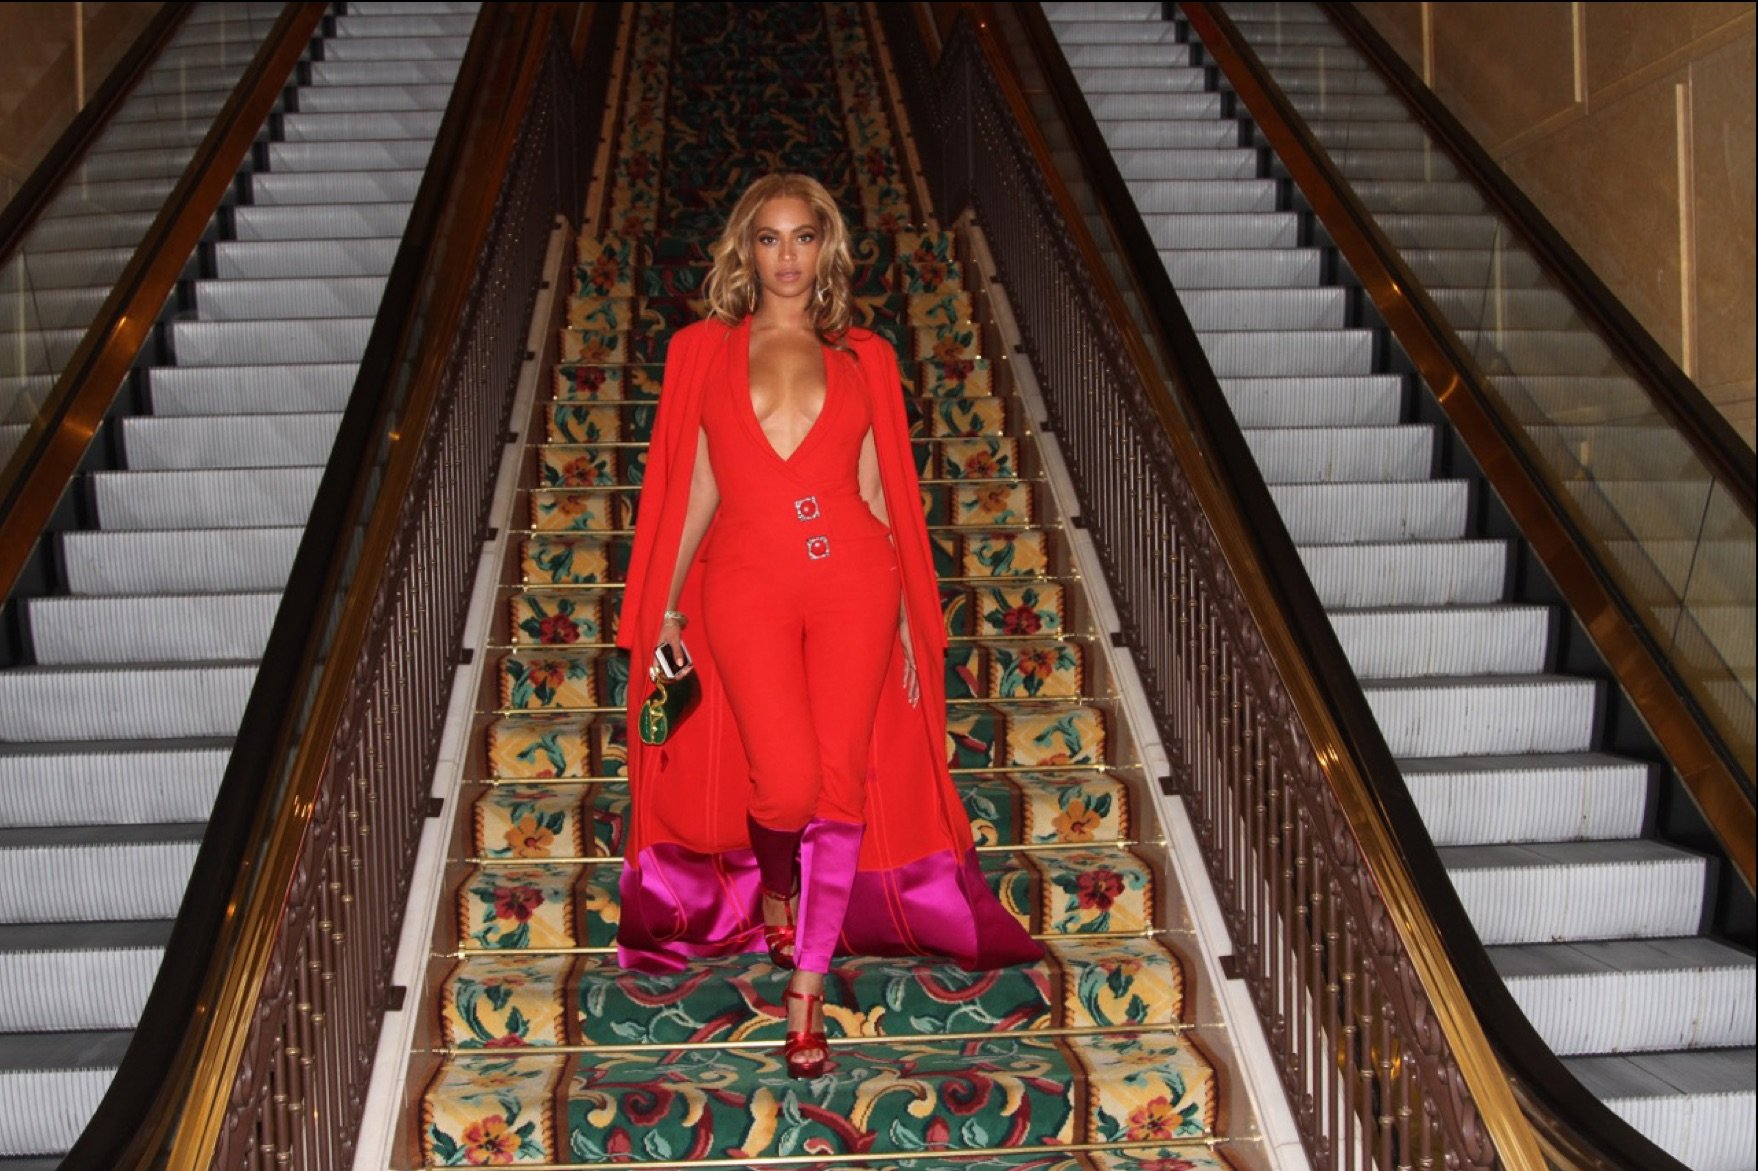 Beyoncé wearing custom caped pantsuit by HARBINSON, 2015.